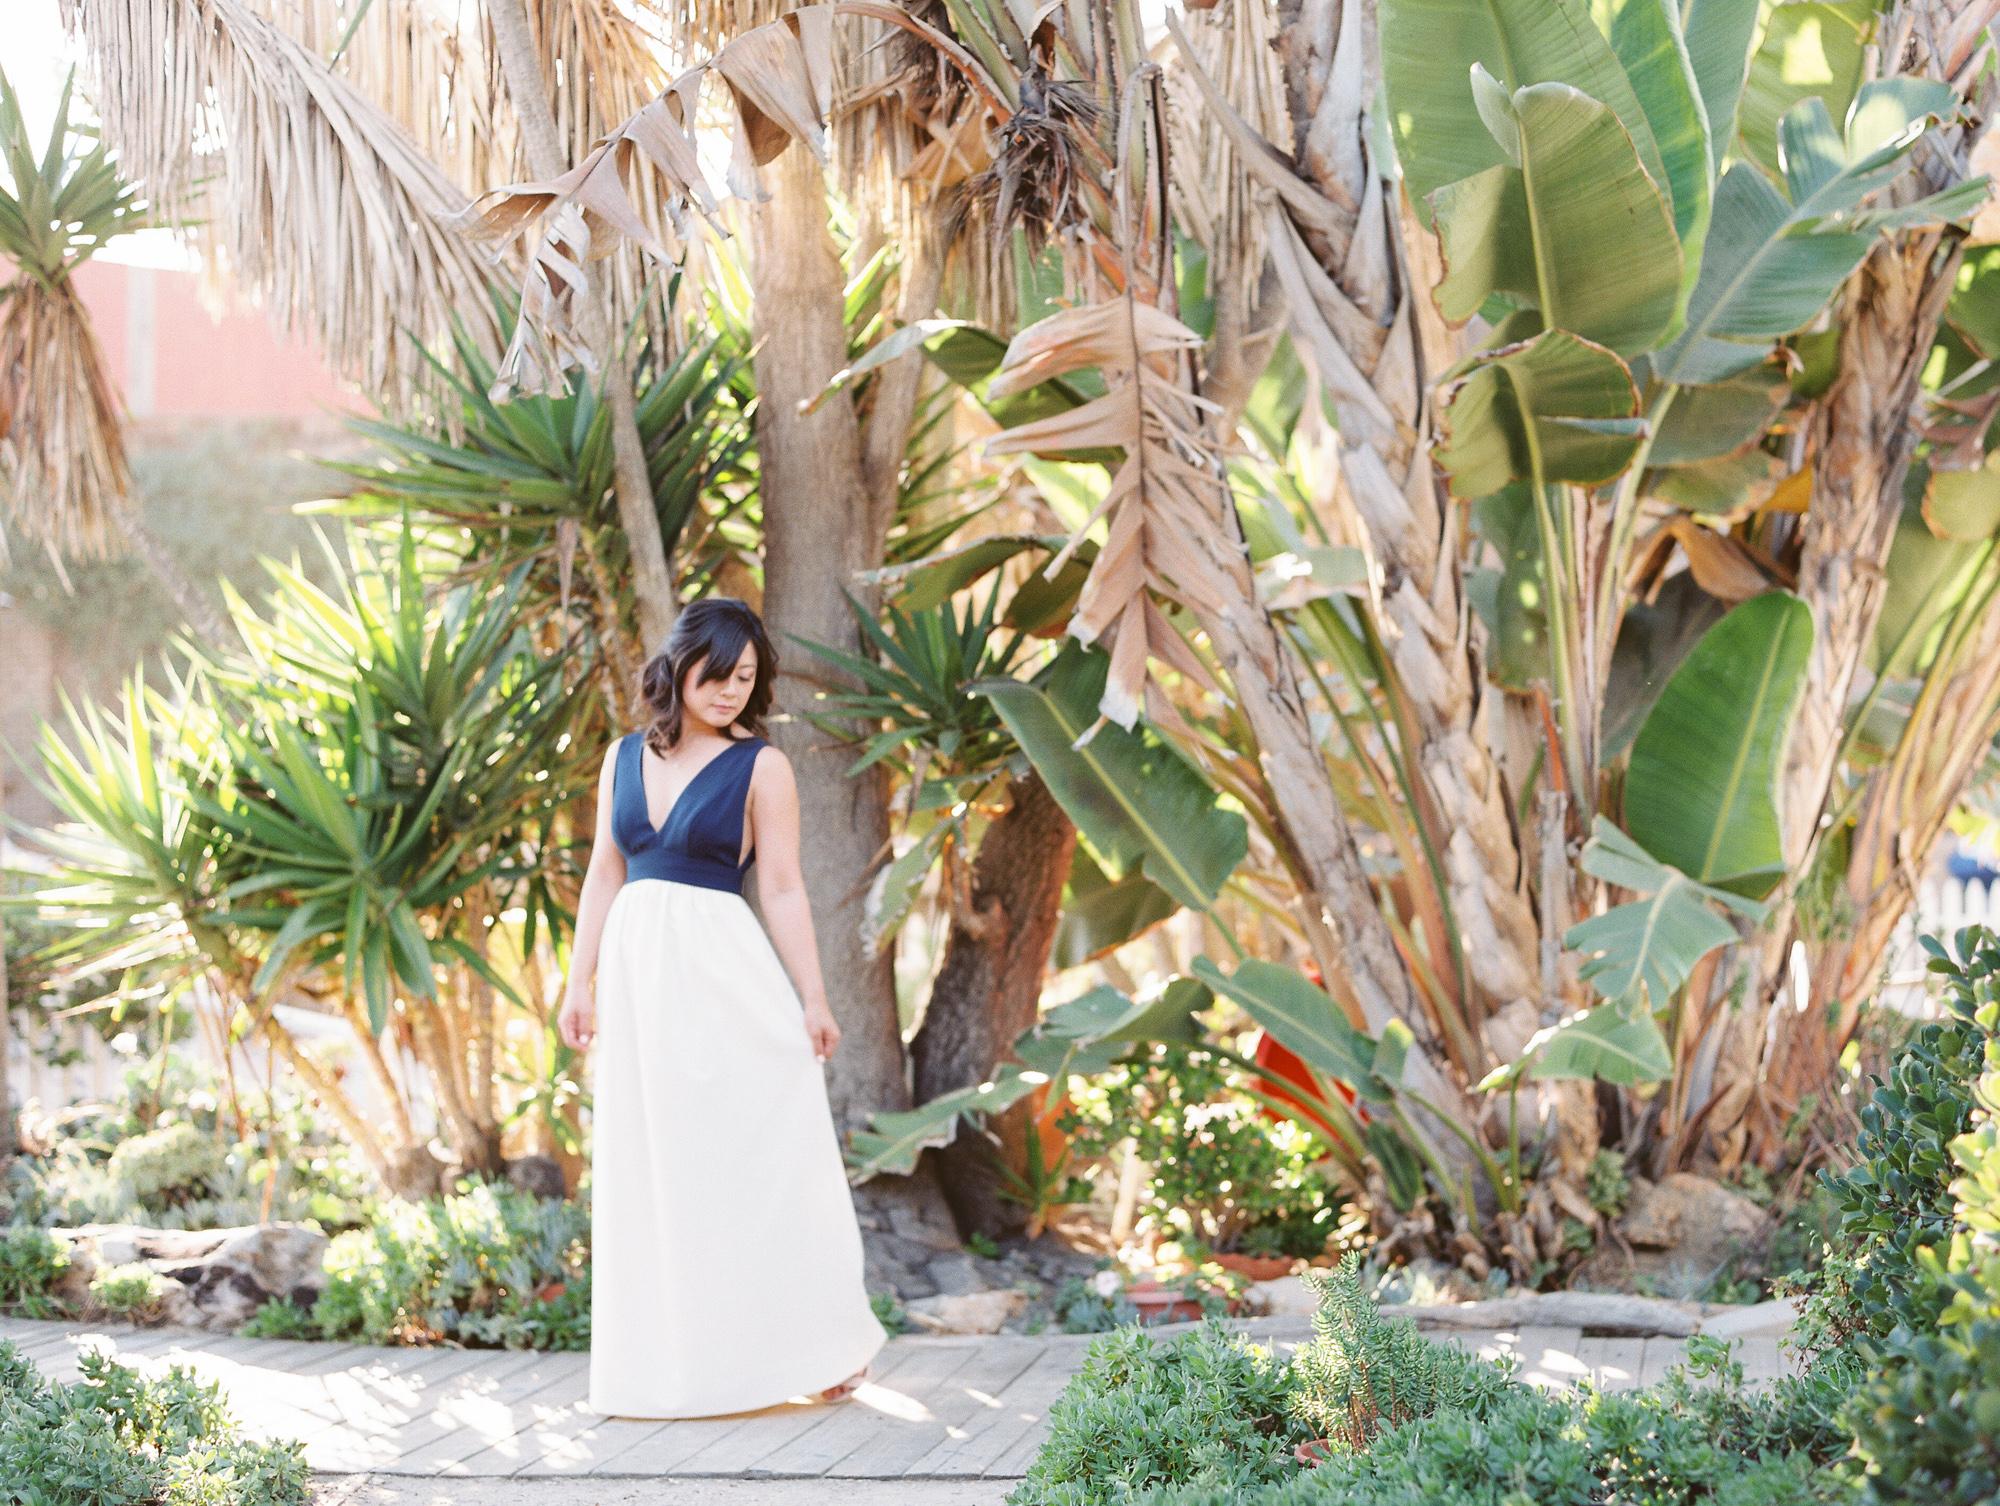 Crystal-Cove-Engagement-Kristina-Adams-7.jpg